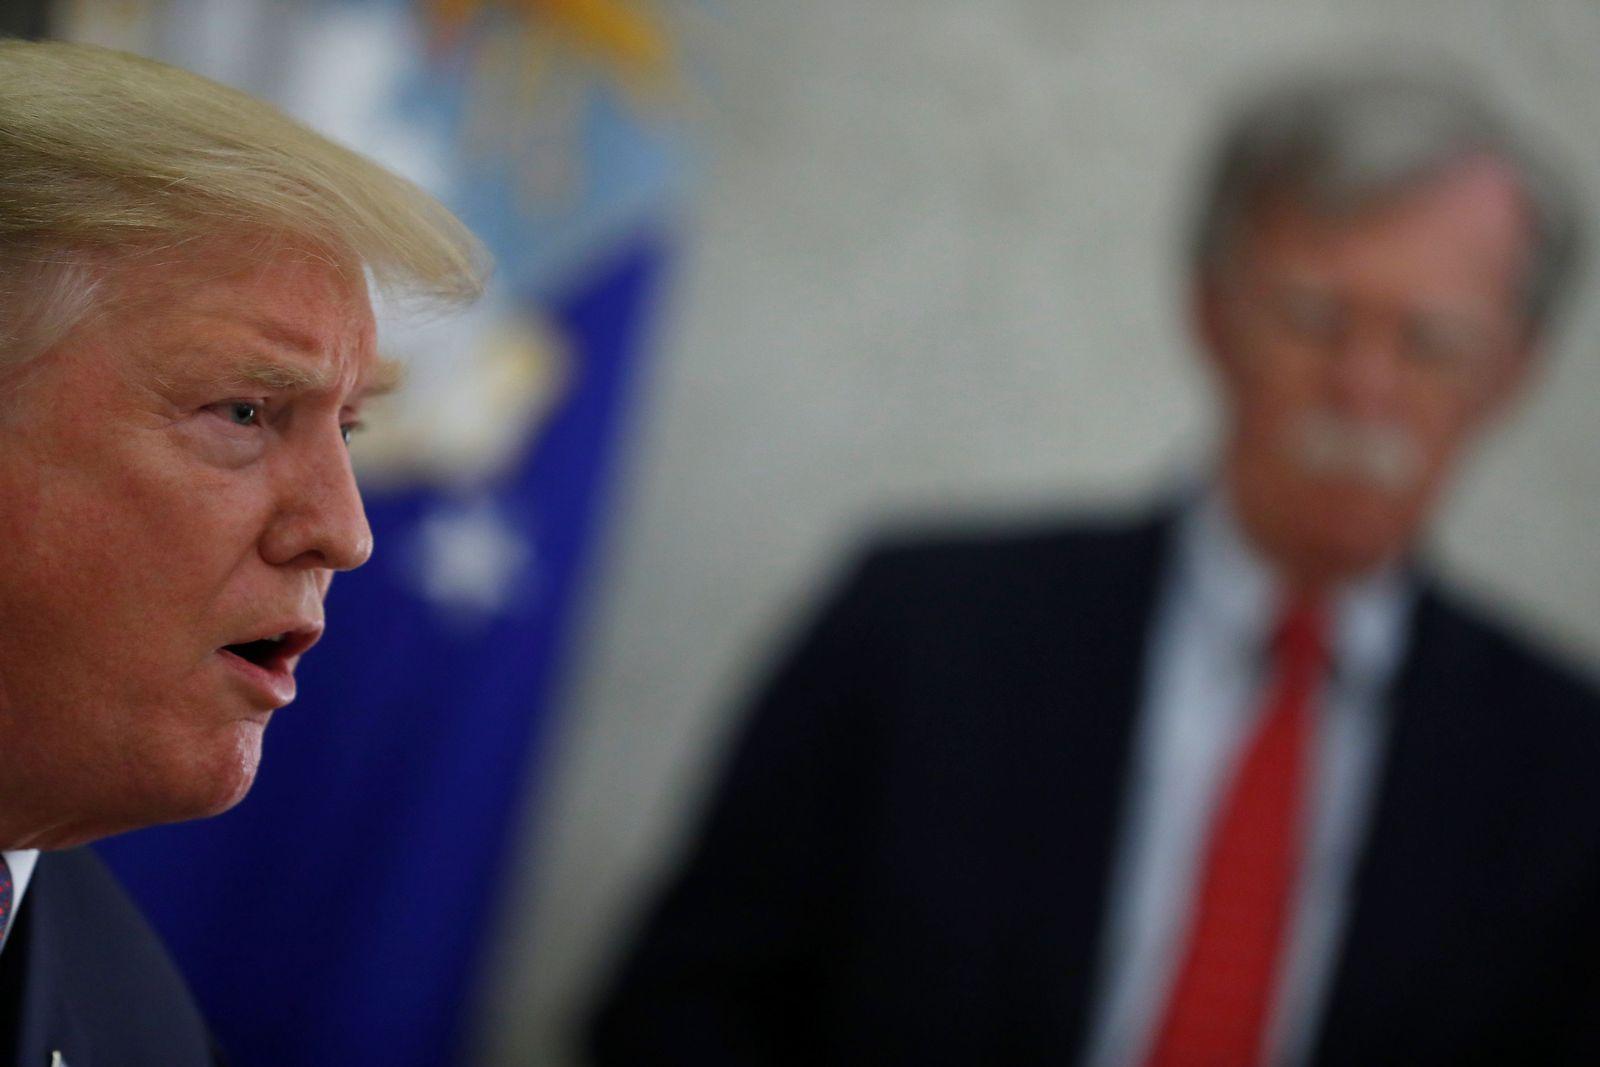 Donald Trump/John Bolton